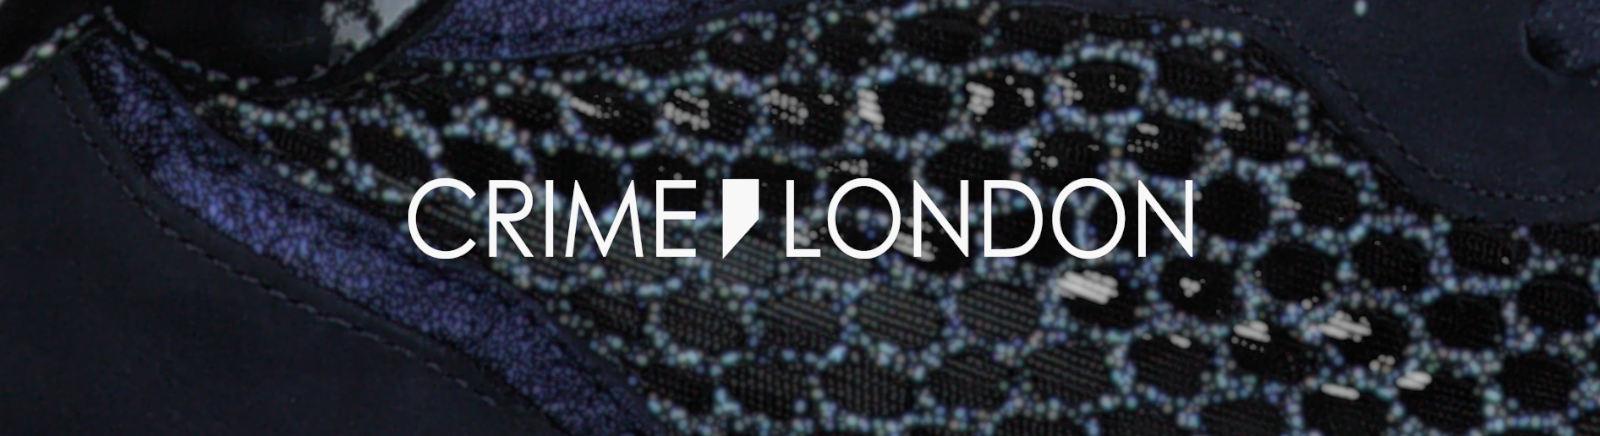 Crime London Herrenschuhe online kaufen im GISY Schuhe Shop